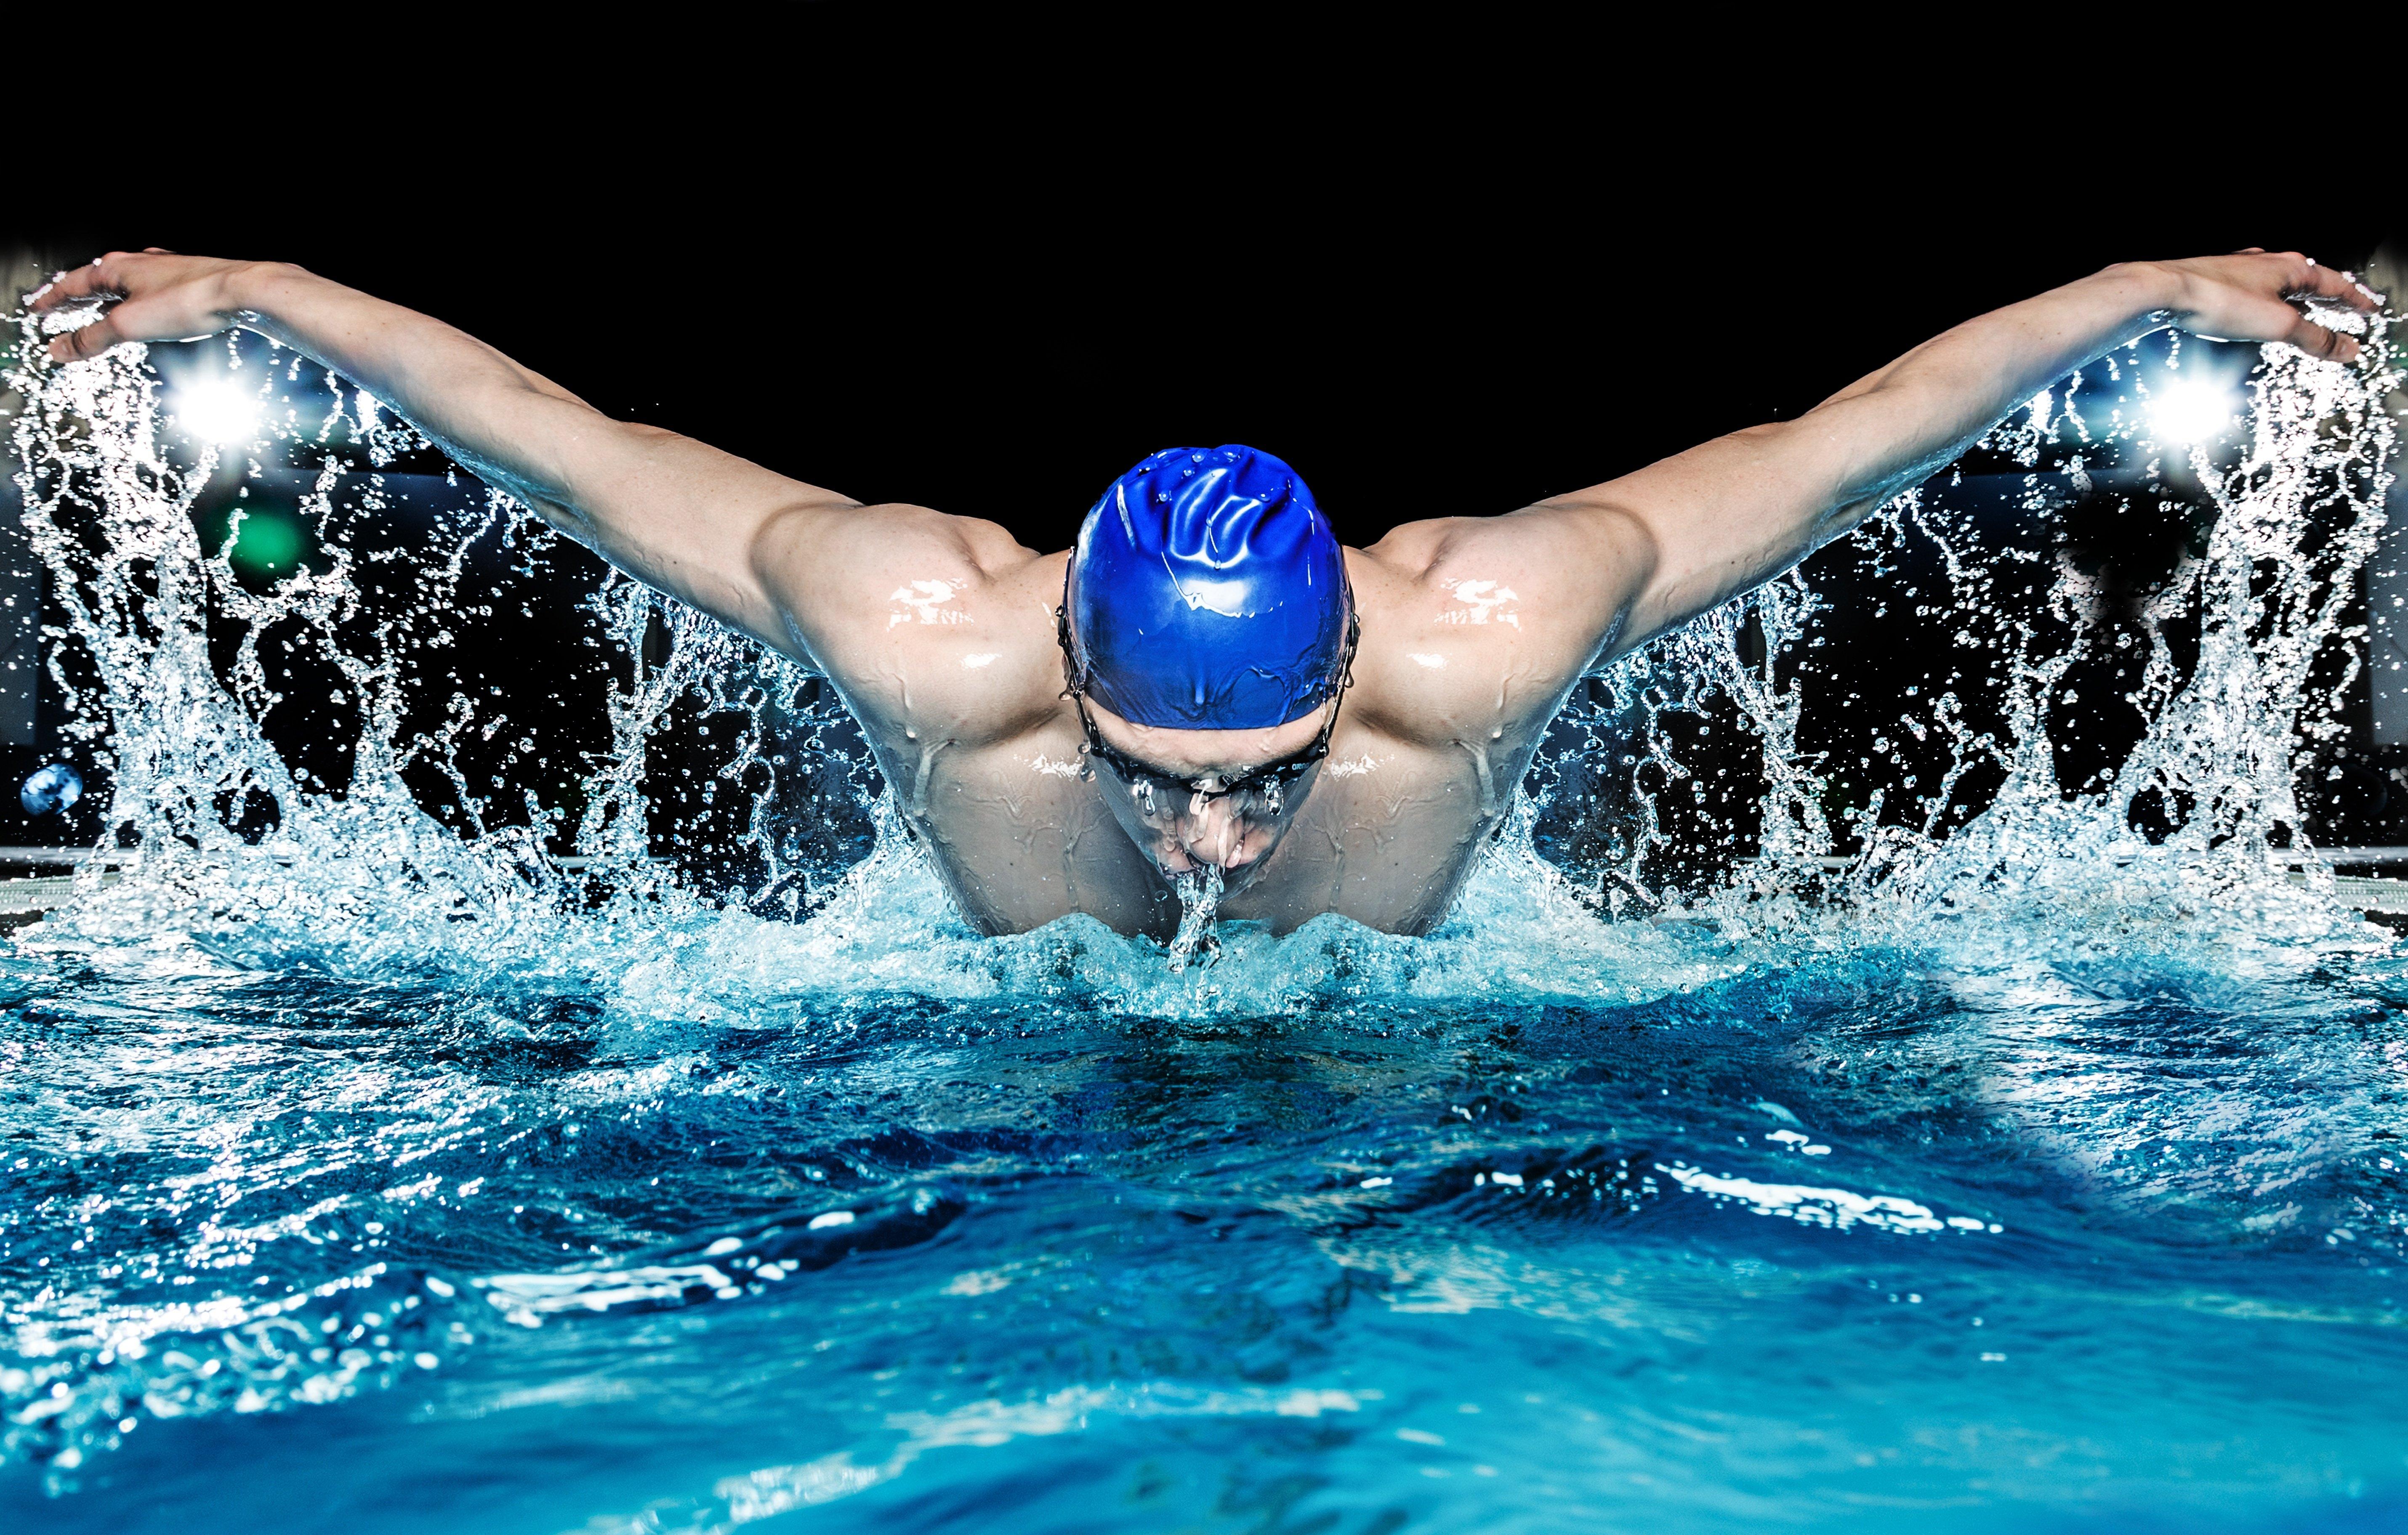 Treinamento Desportivo para Nadadores de Alto Nível